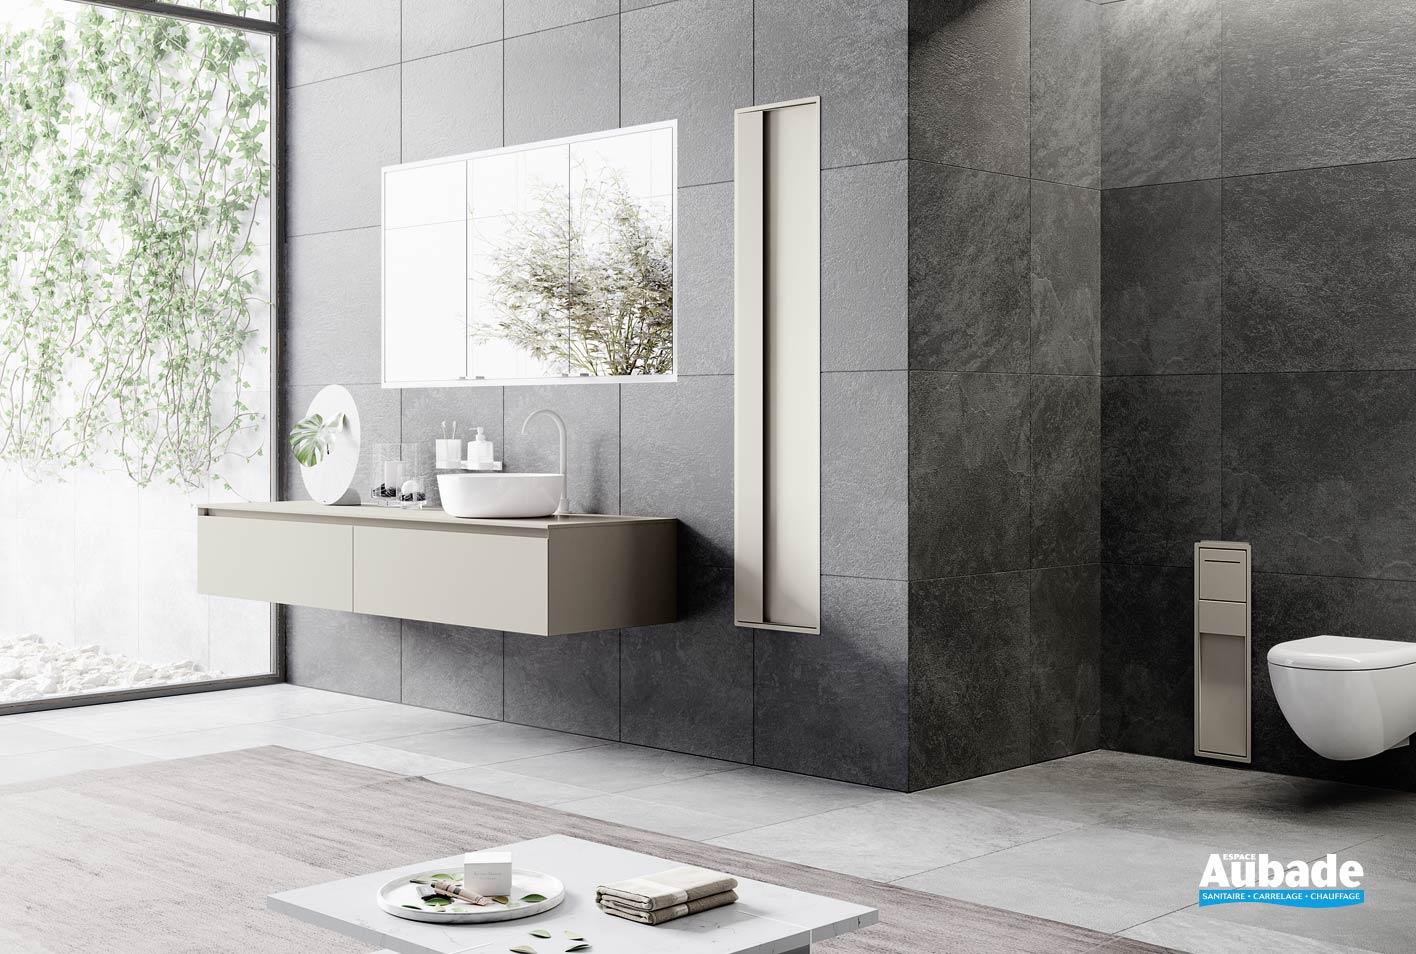 meuble salle de bain acuto inda espace aubade. Black Bedroom Furniture Sets. Home Design Ideas